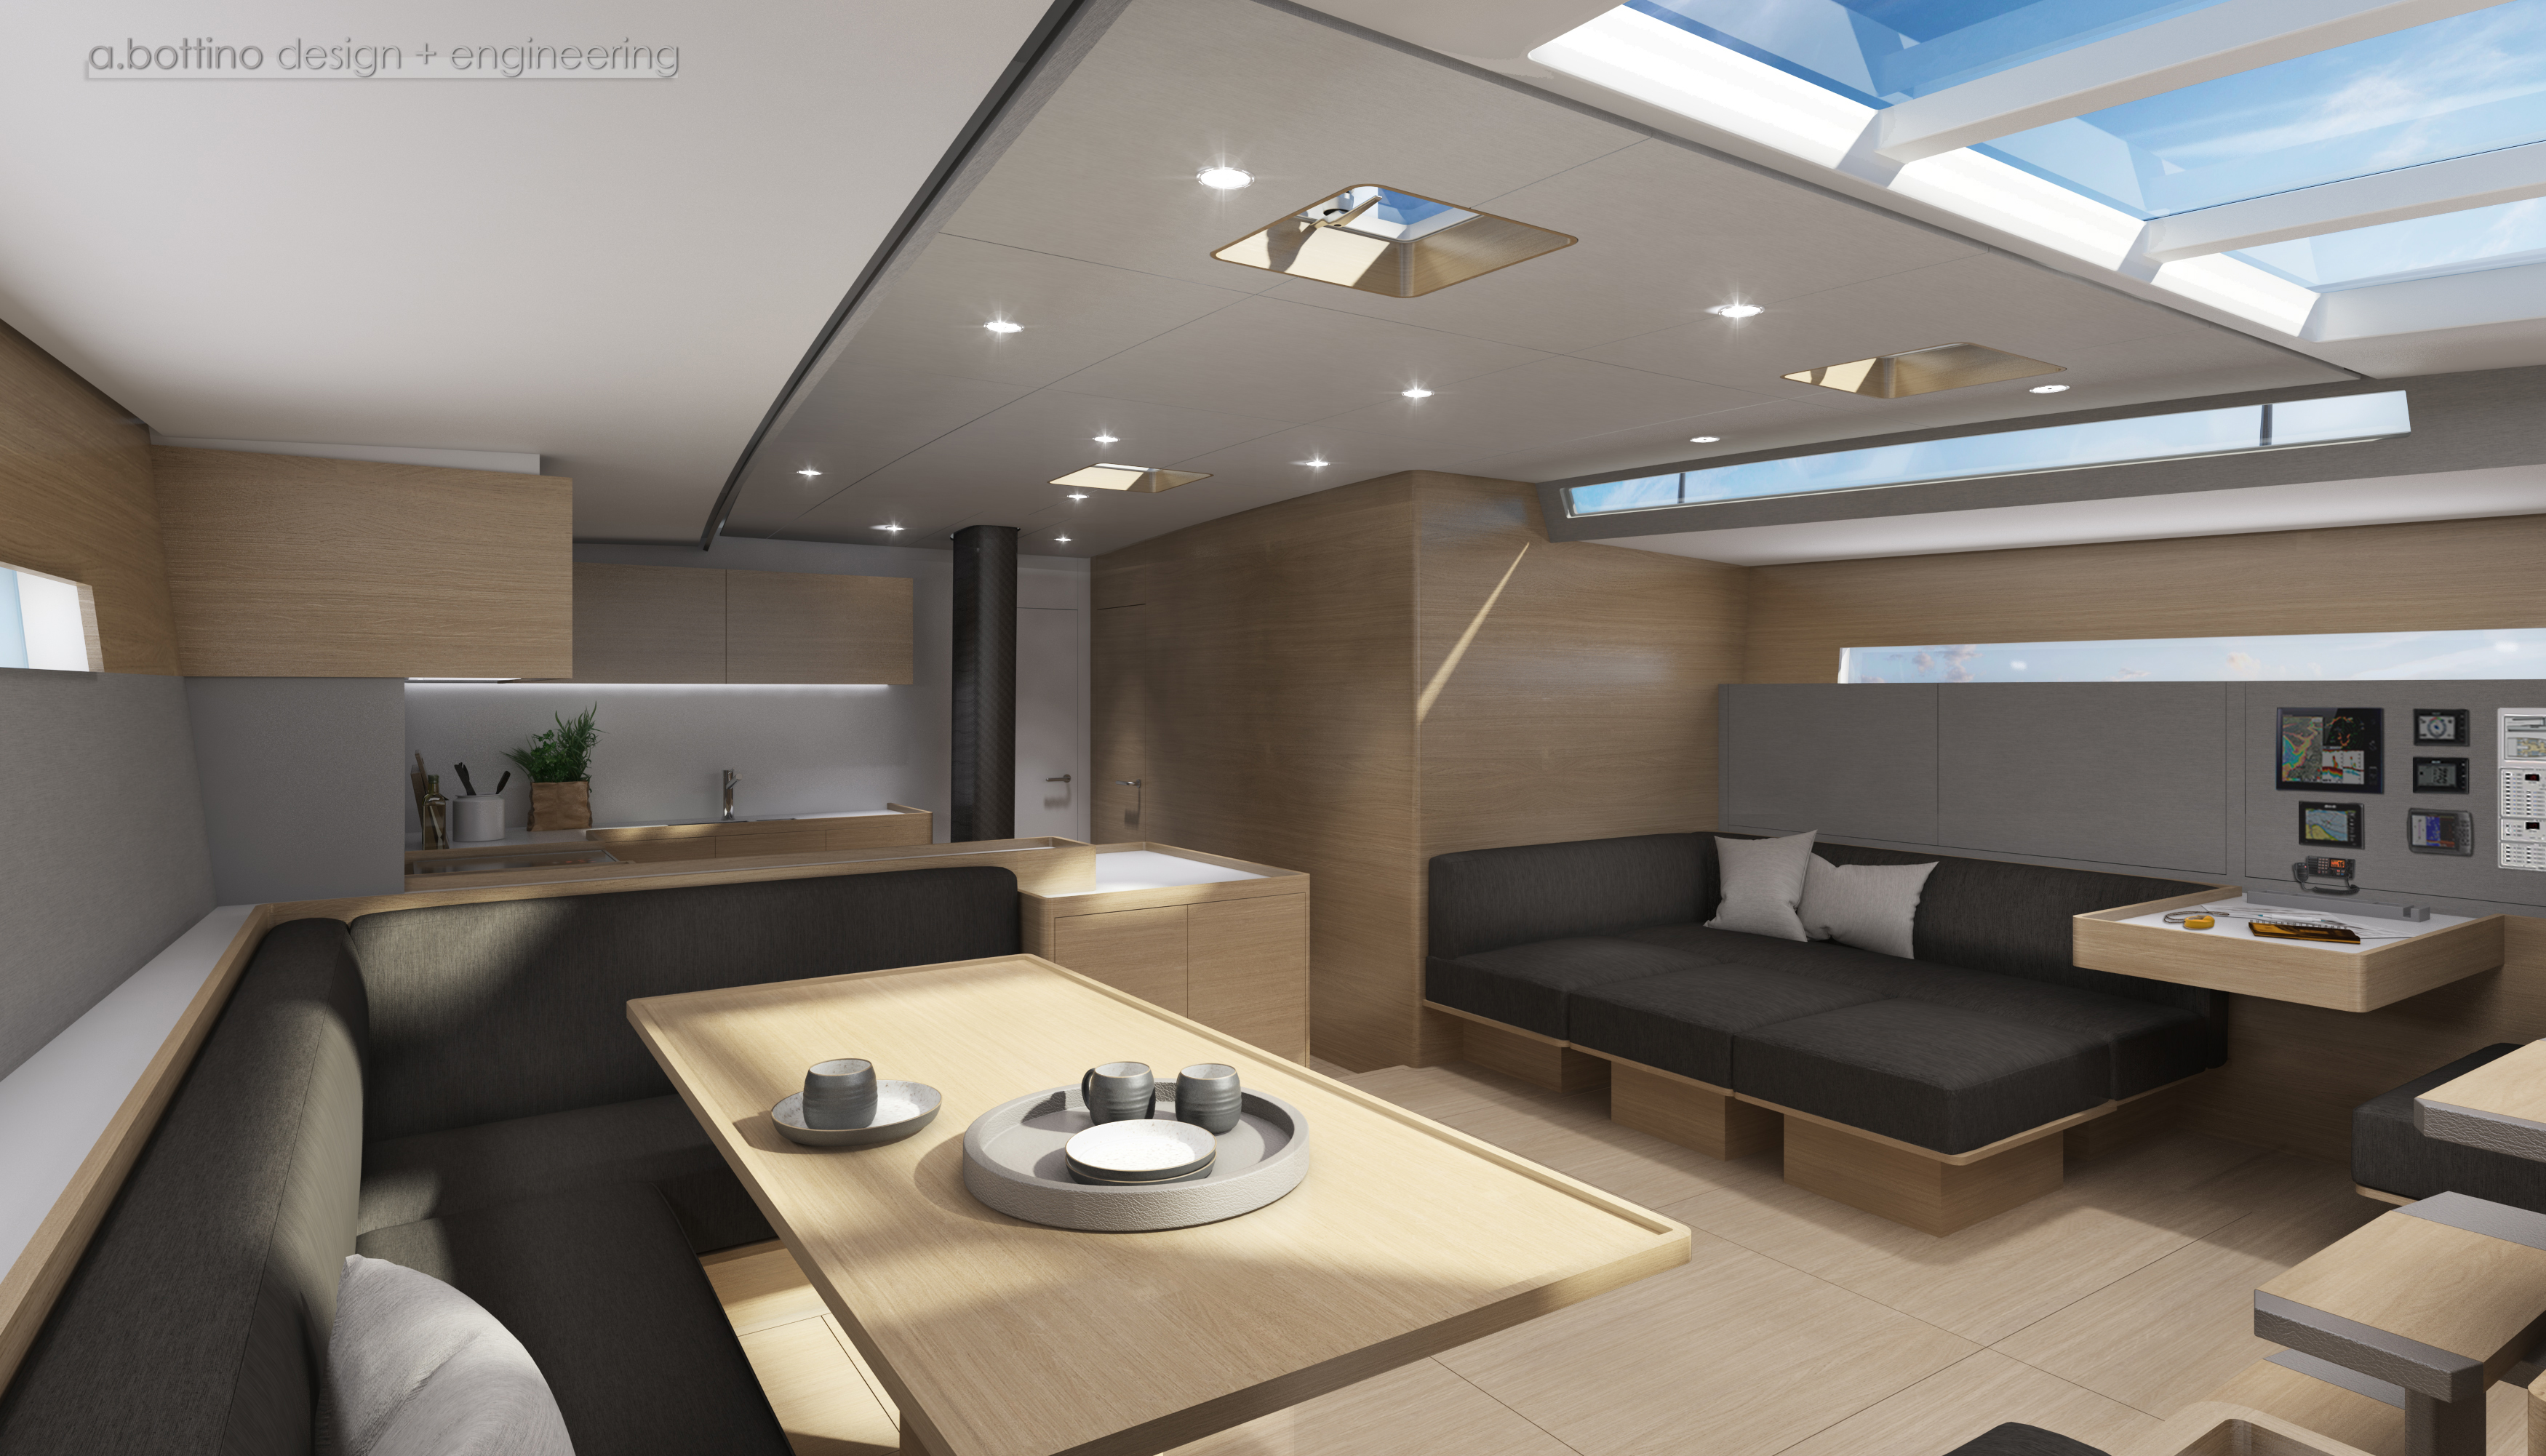 80 interior a bottino design engineering rh abottinodesign com interior design engineer job description interior design engineer salary